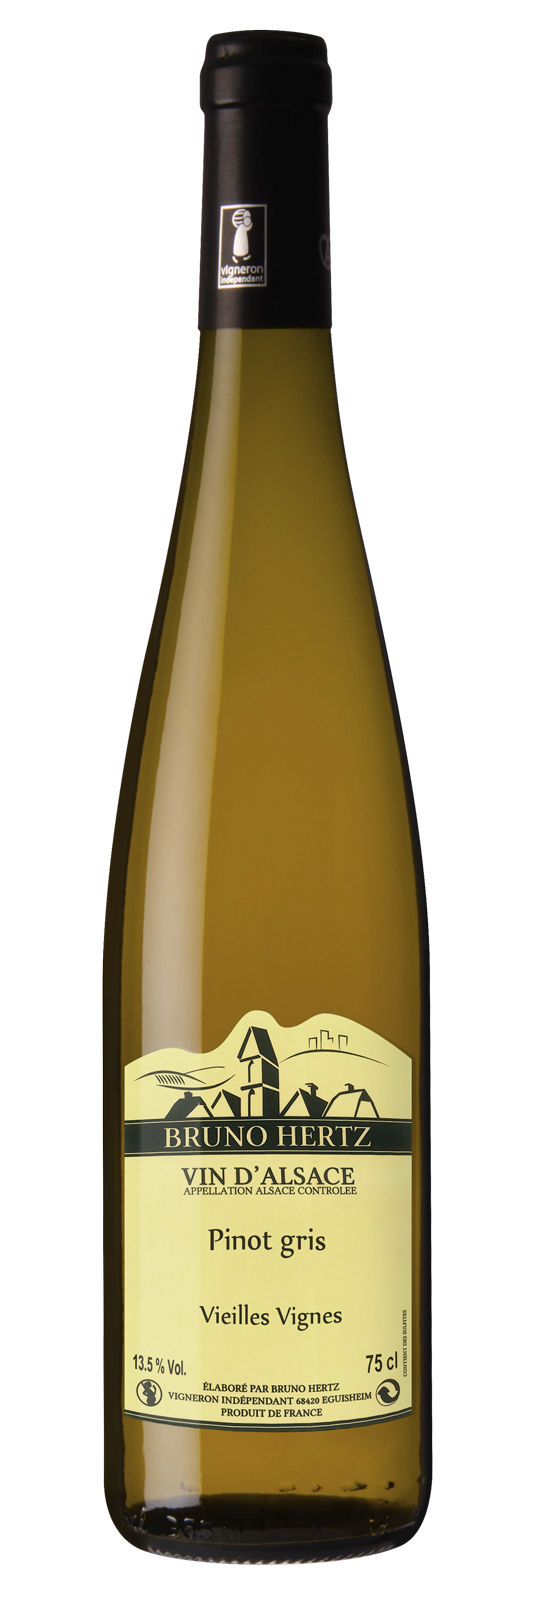 Bruno-Hertz_PINOT-GRIS-Vieilles-Vignes